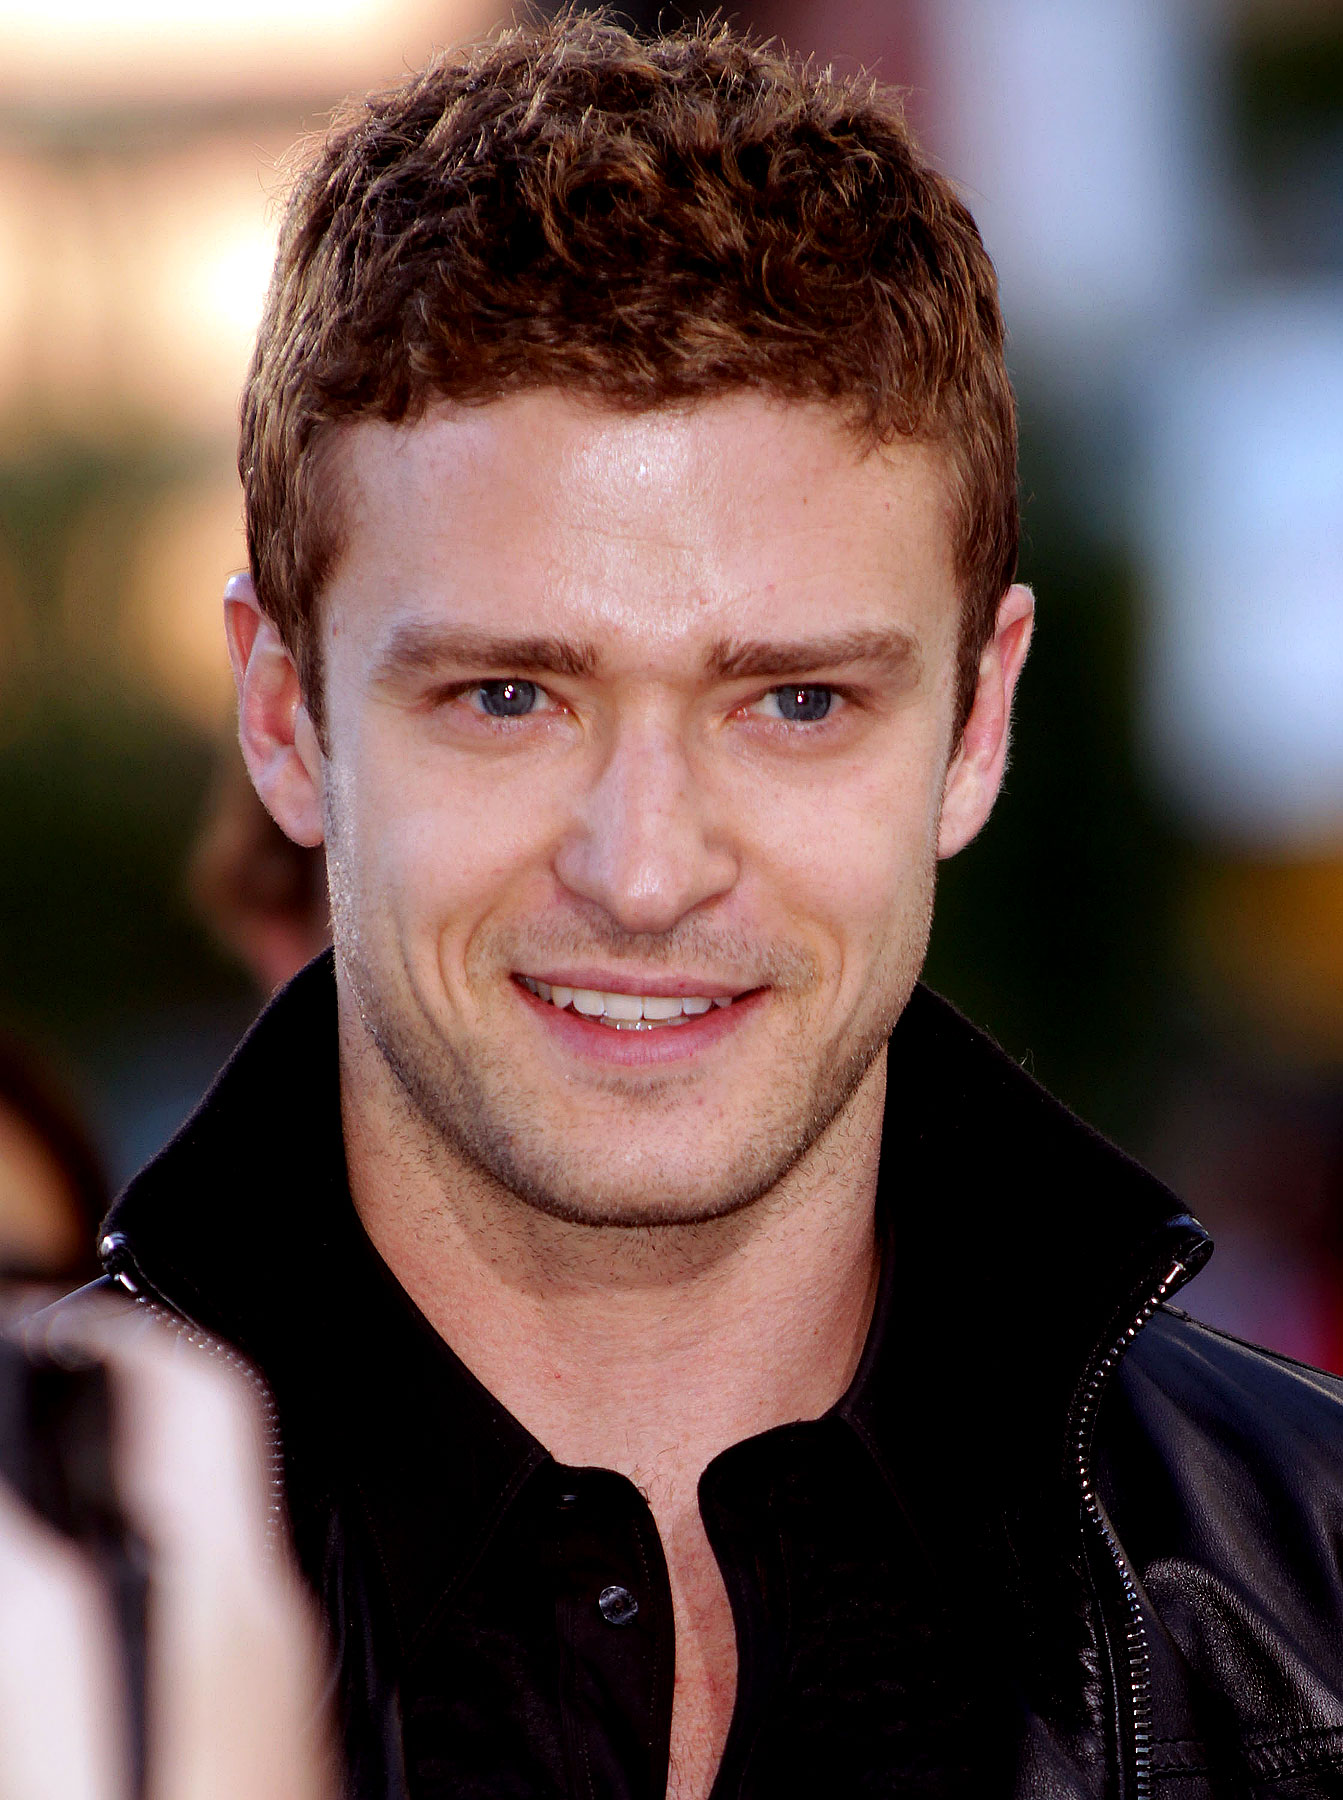 Justin Timberlake at 2010 MTV Video Music Awards (PHOTOS)